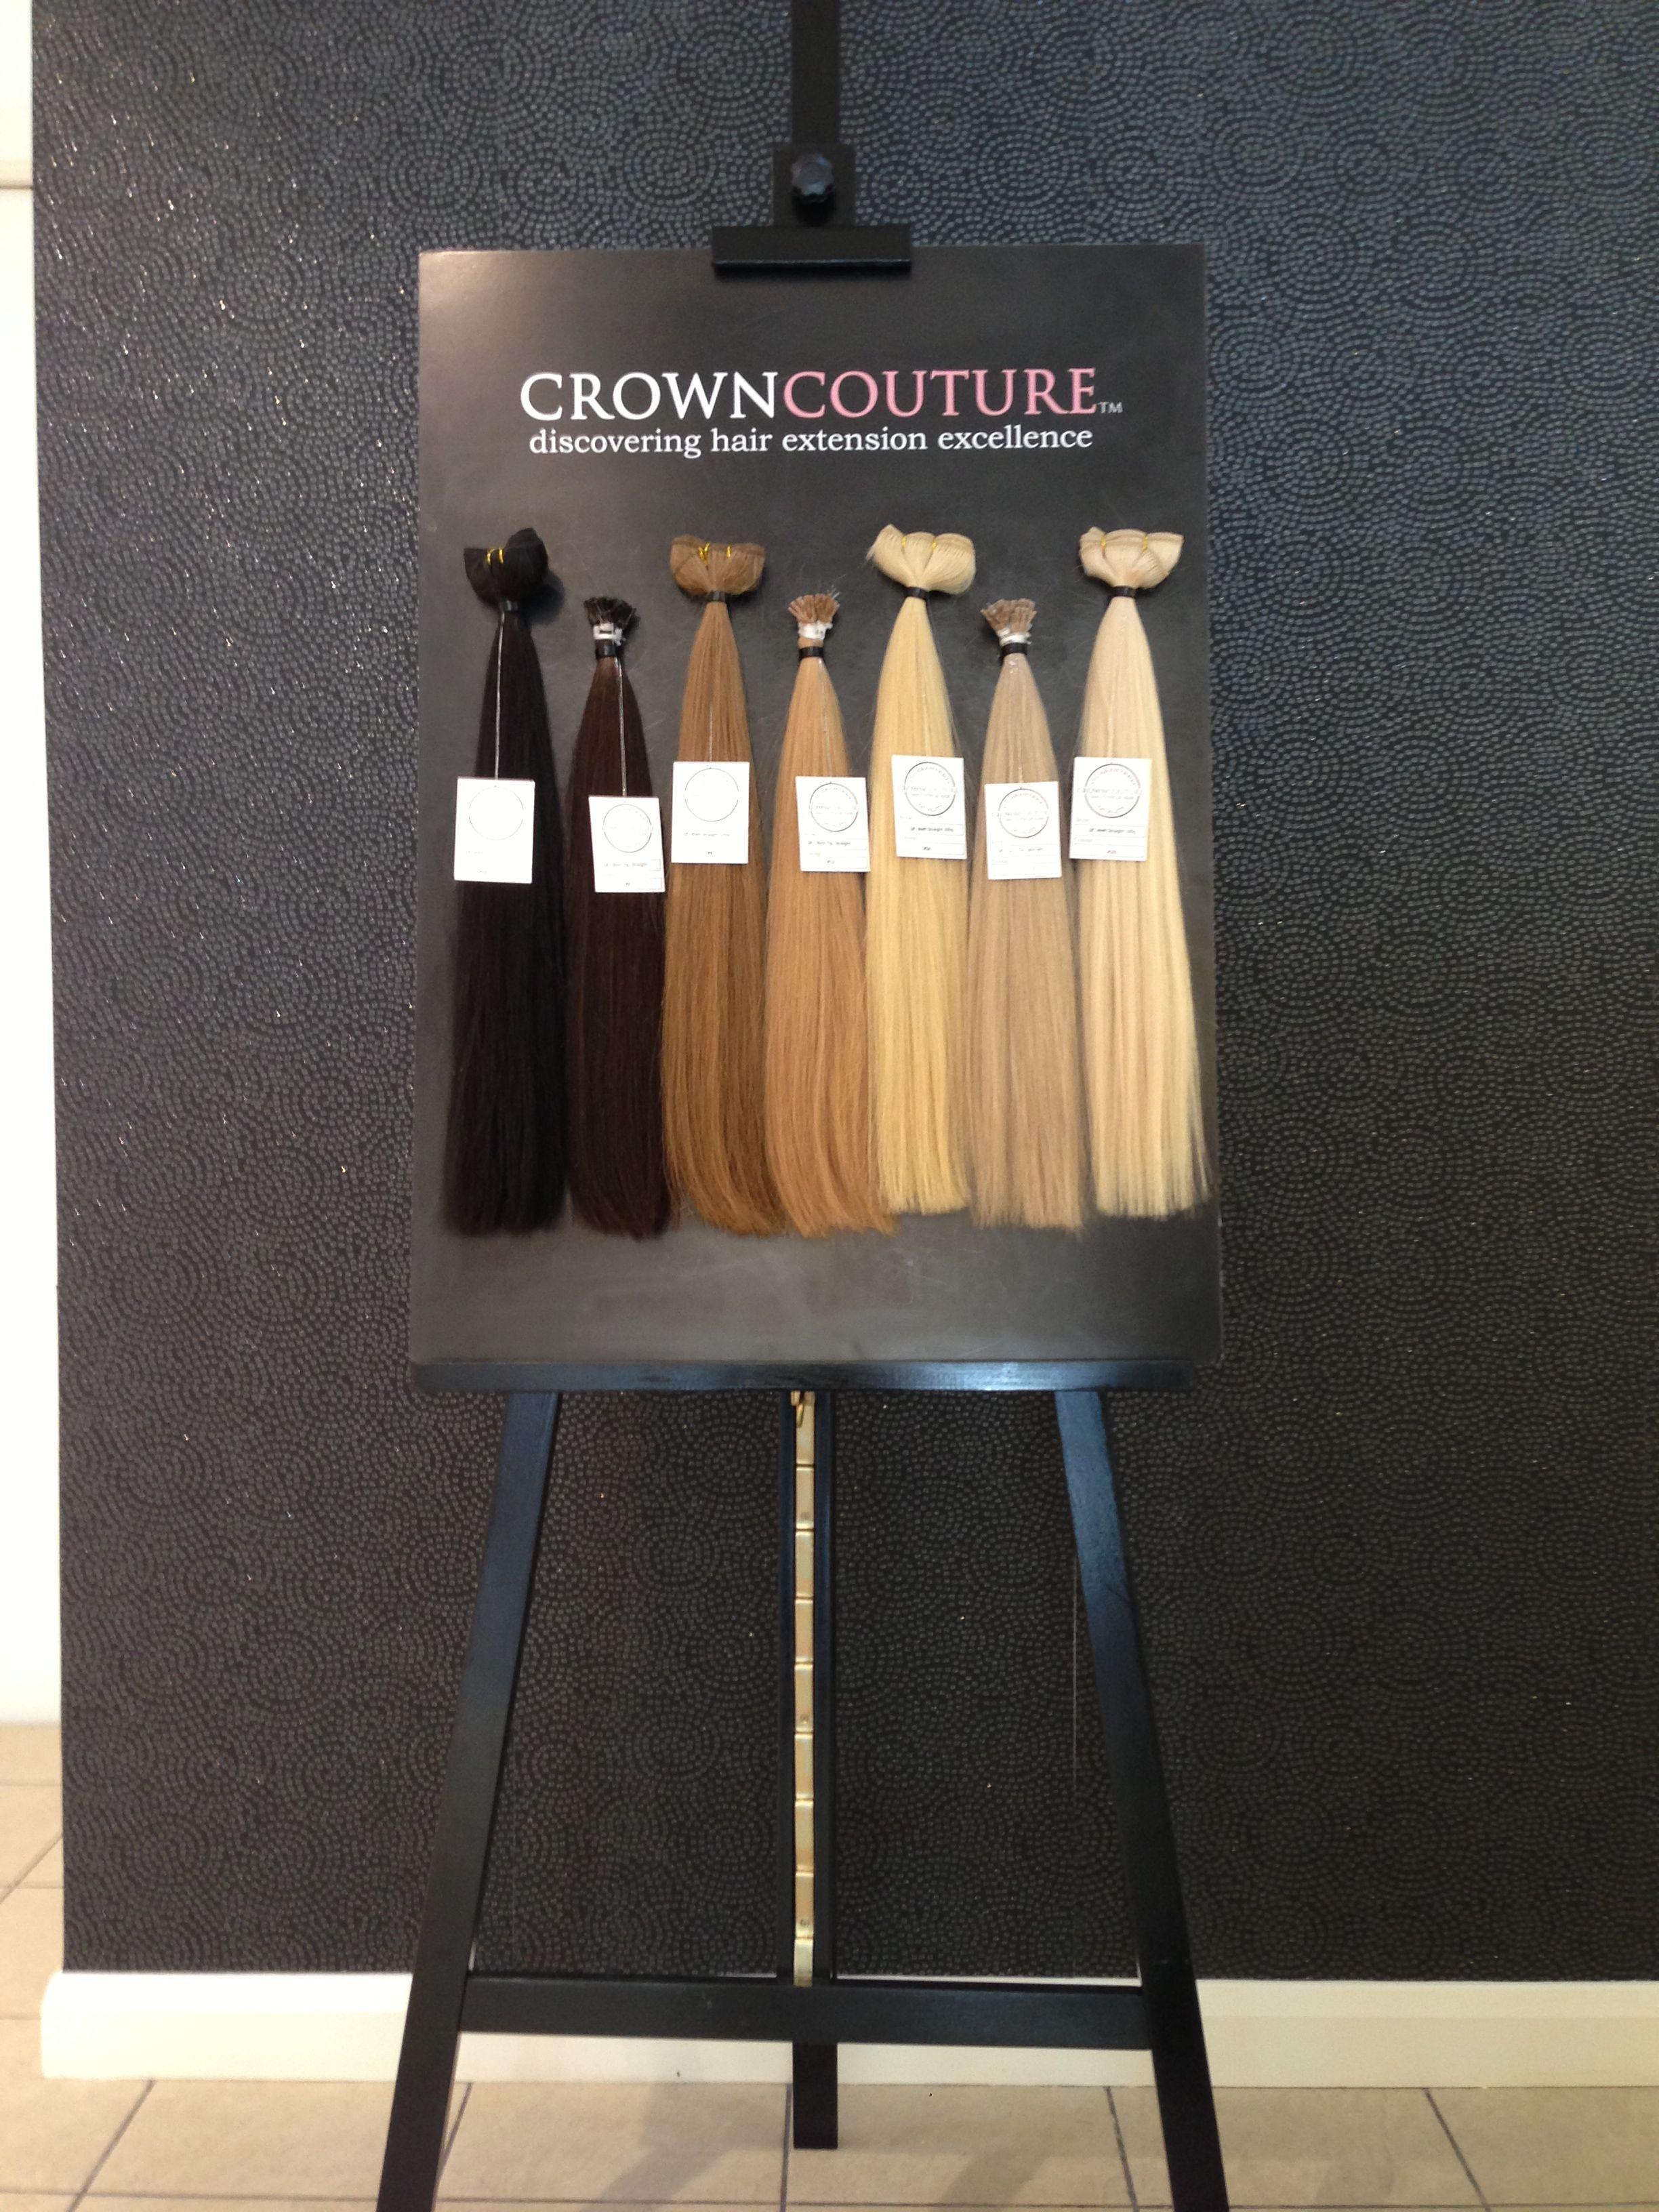 Crowncouture Hair Extension Boutique Retail Pinterest Hair